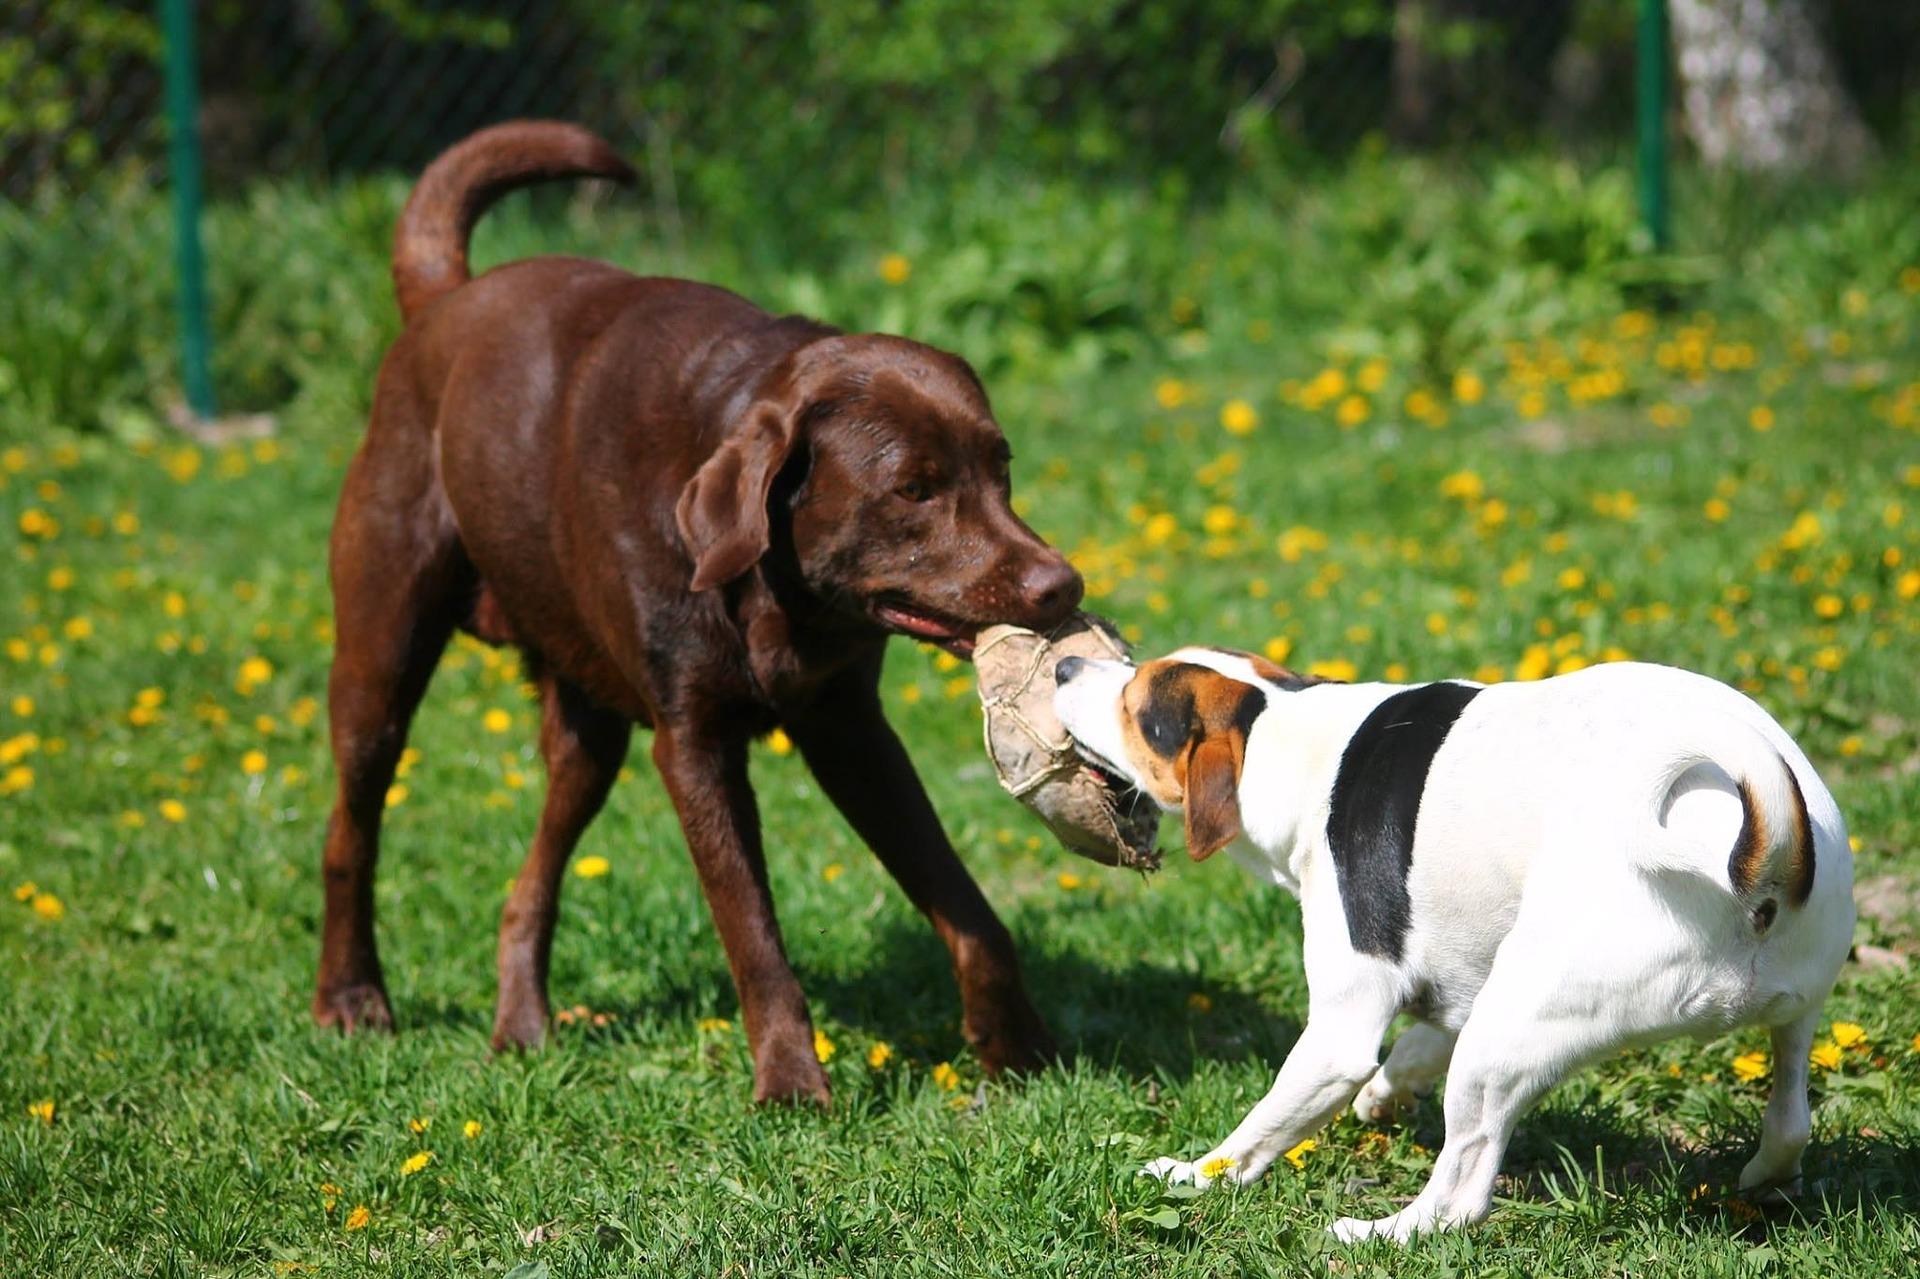 Dog Parks U.S.